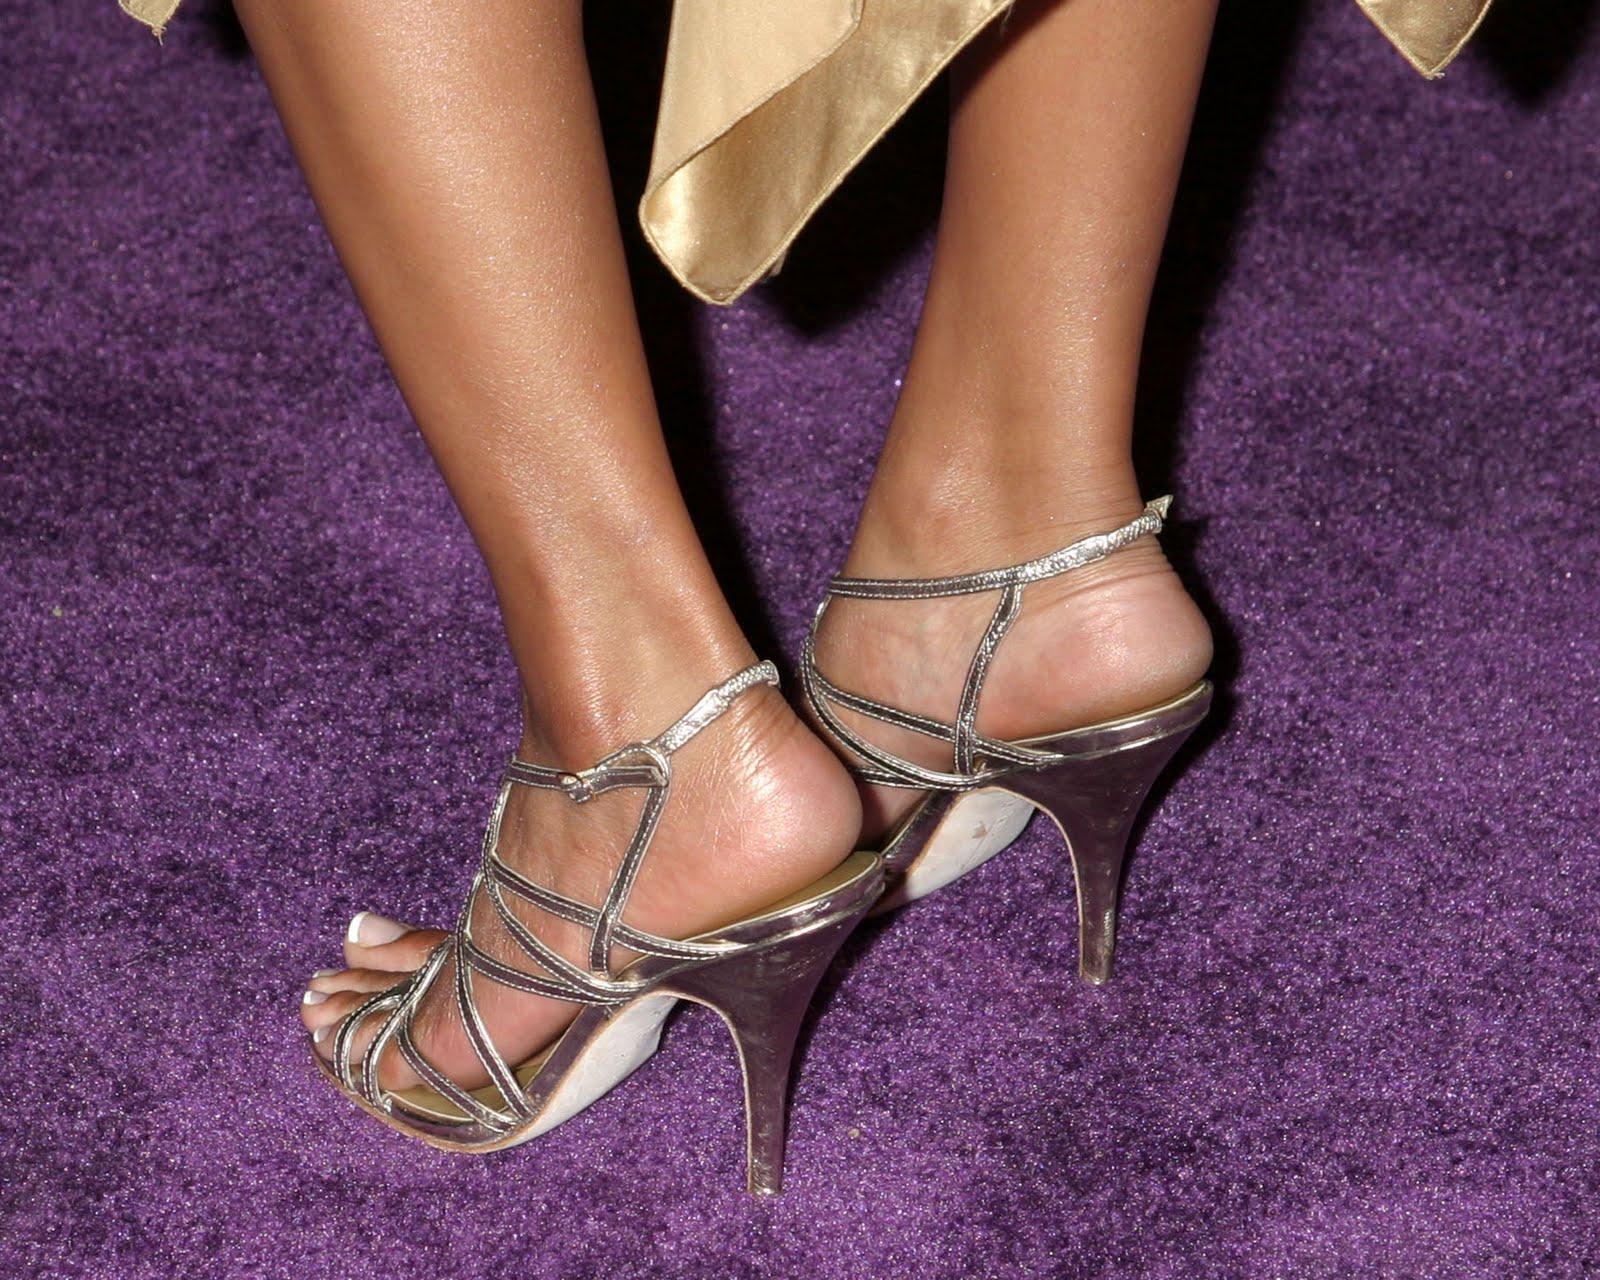 Good Feet 79